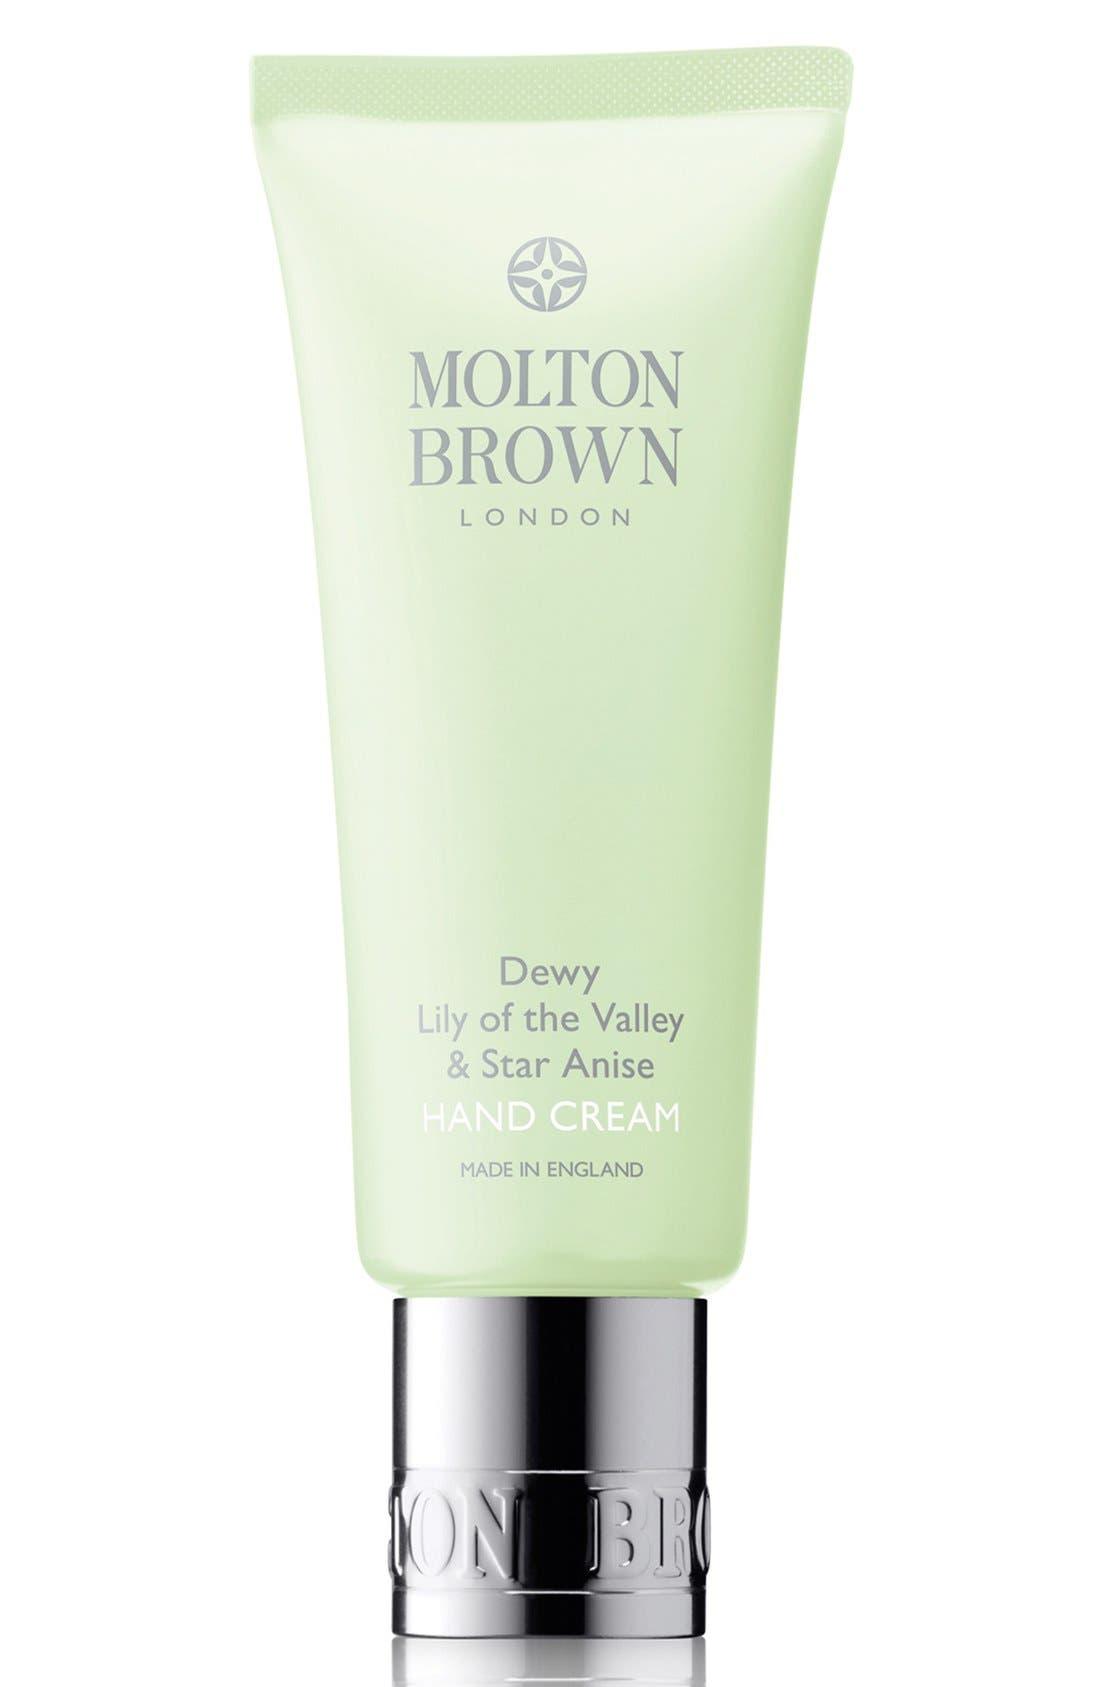 MOLTON BROWN London Replenishing Hand Cream